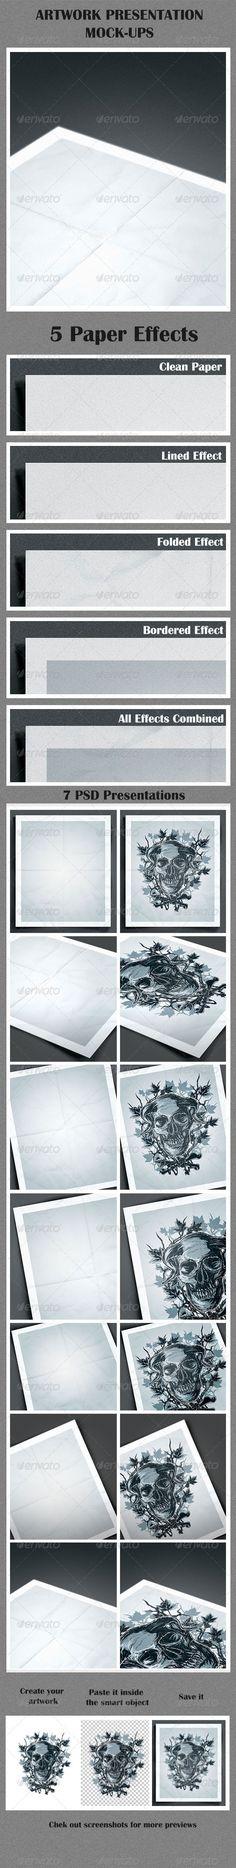 Artwork Presentation Mock-Ups - Print Product Mock-Ups